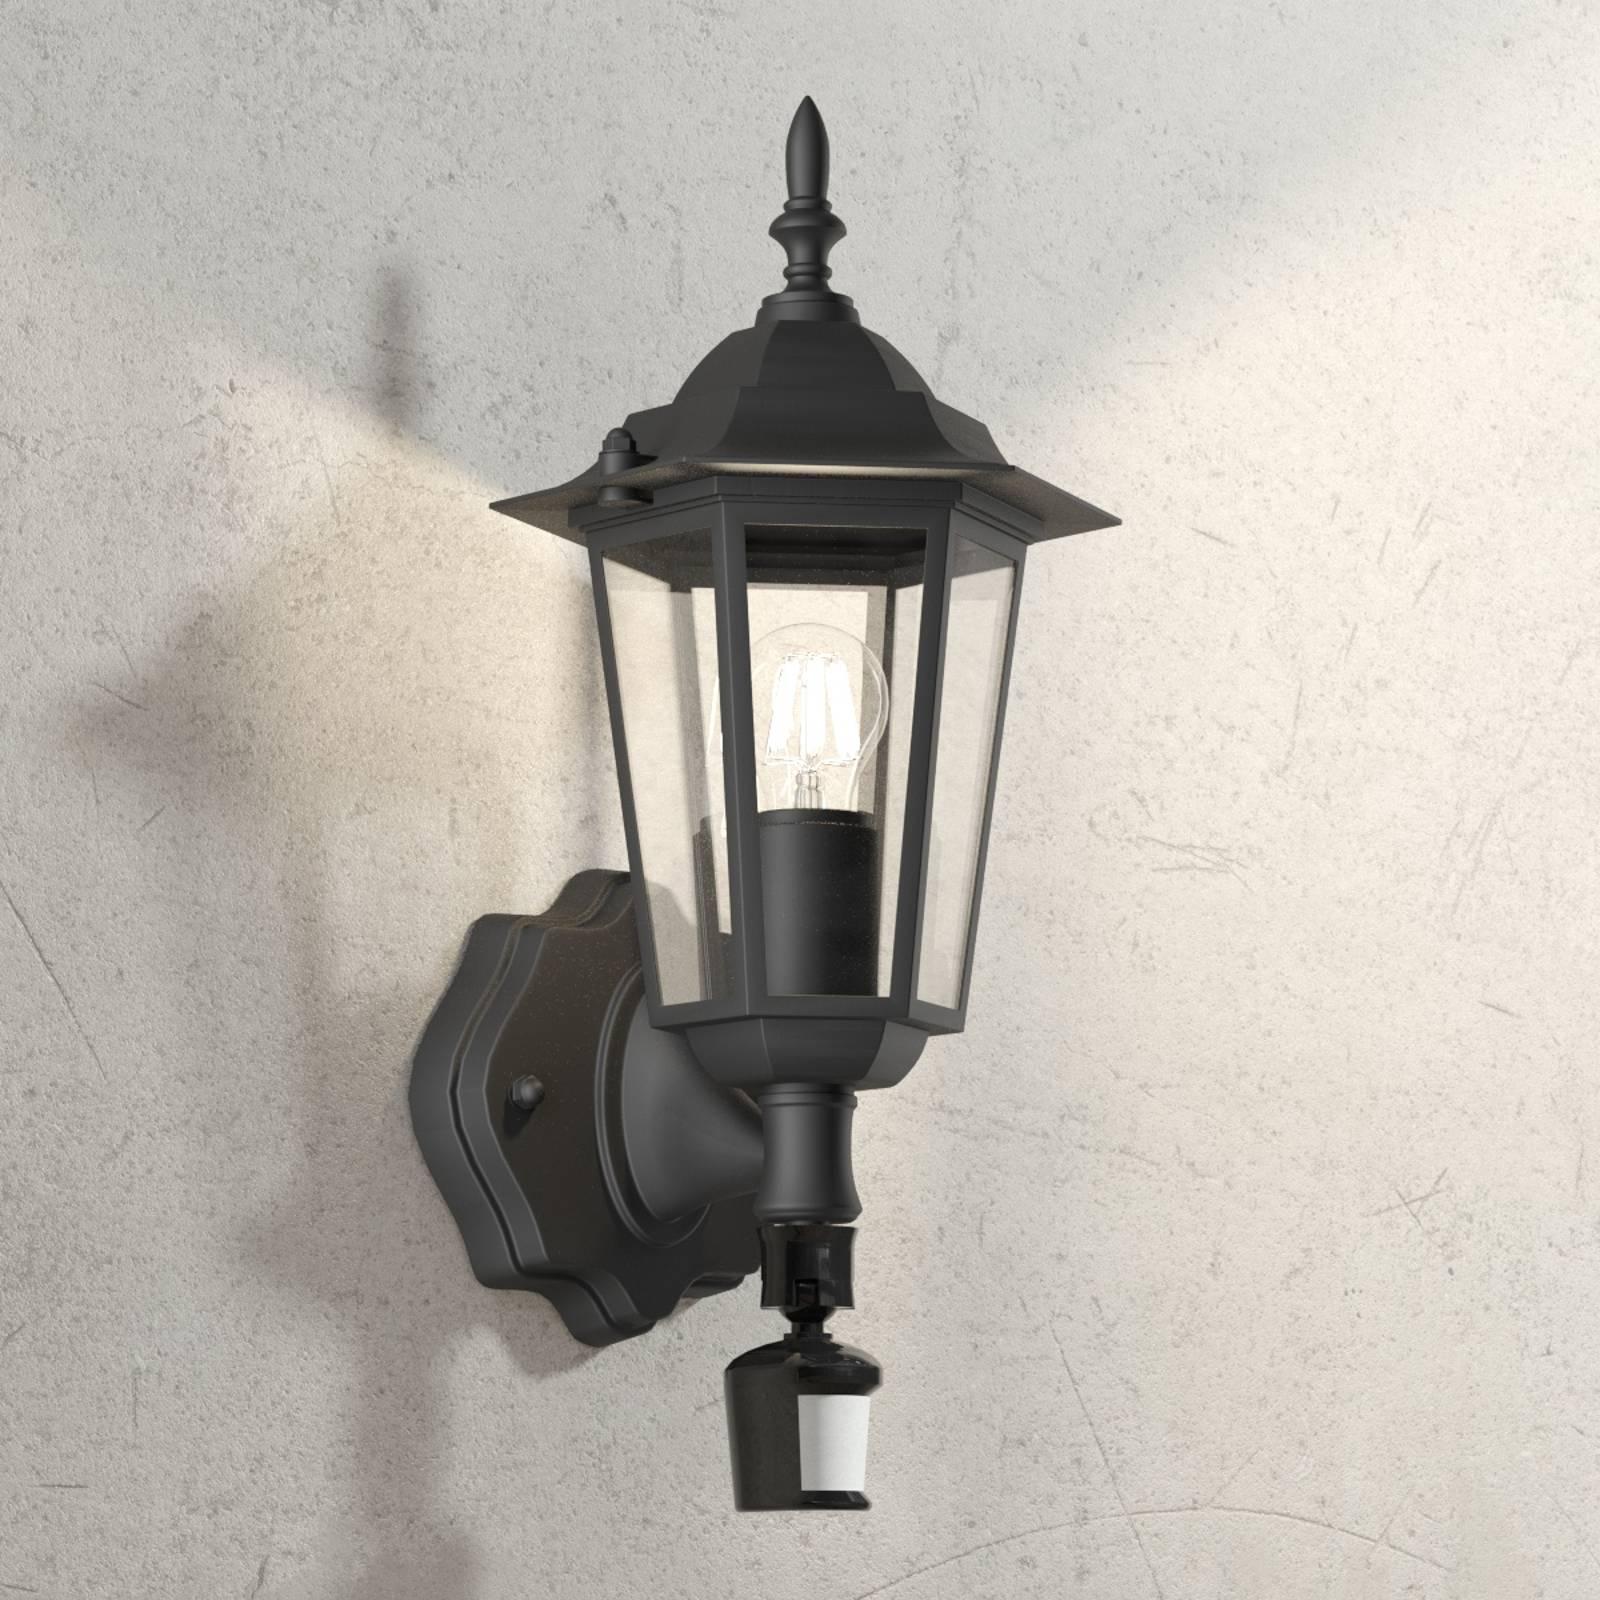 Buitenwandlamp Laterna 4 zwart, met sensor